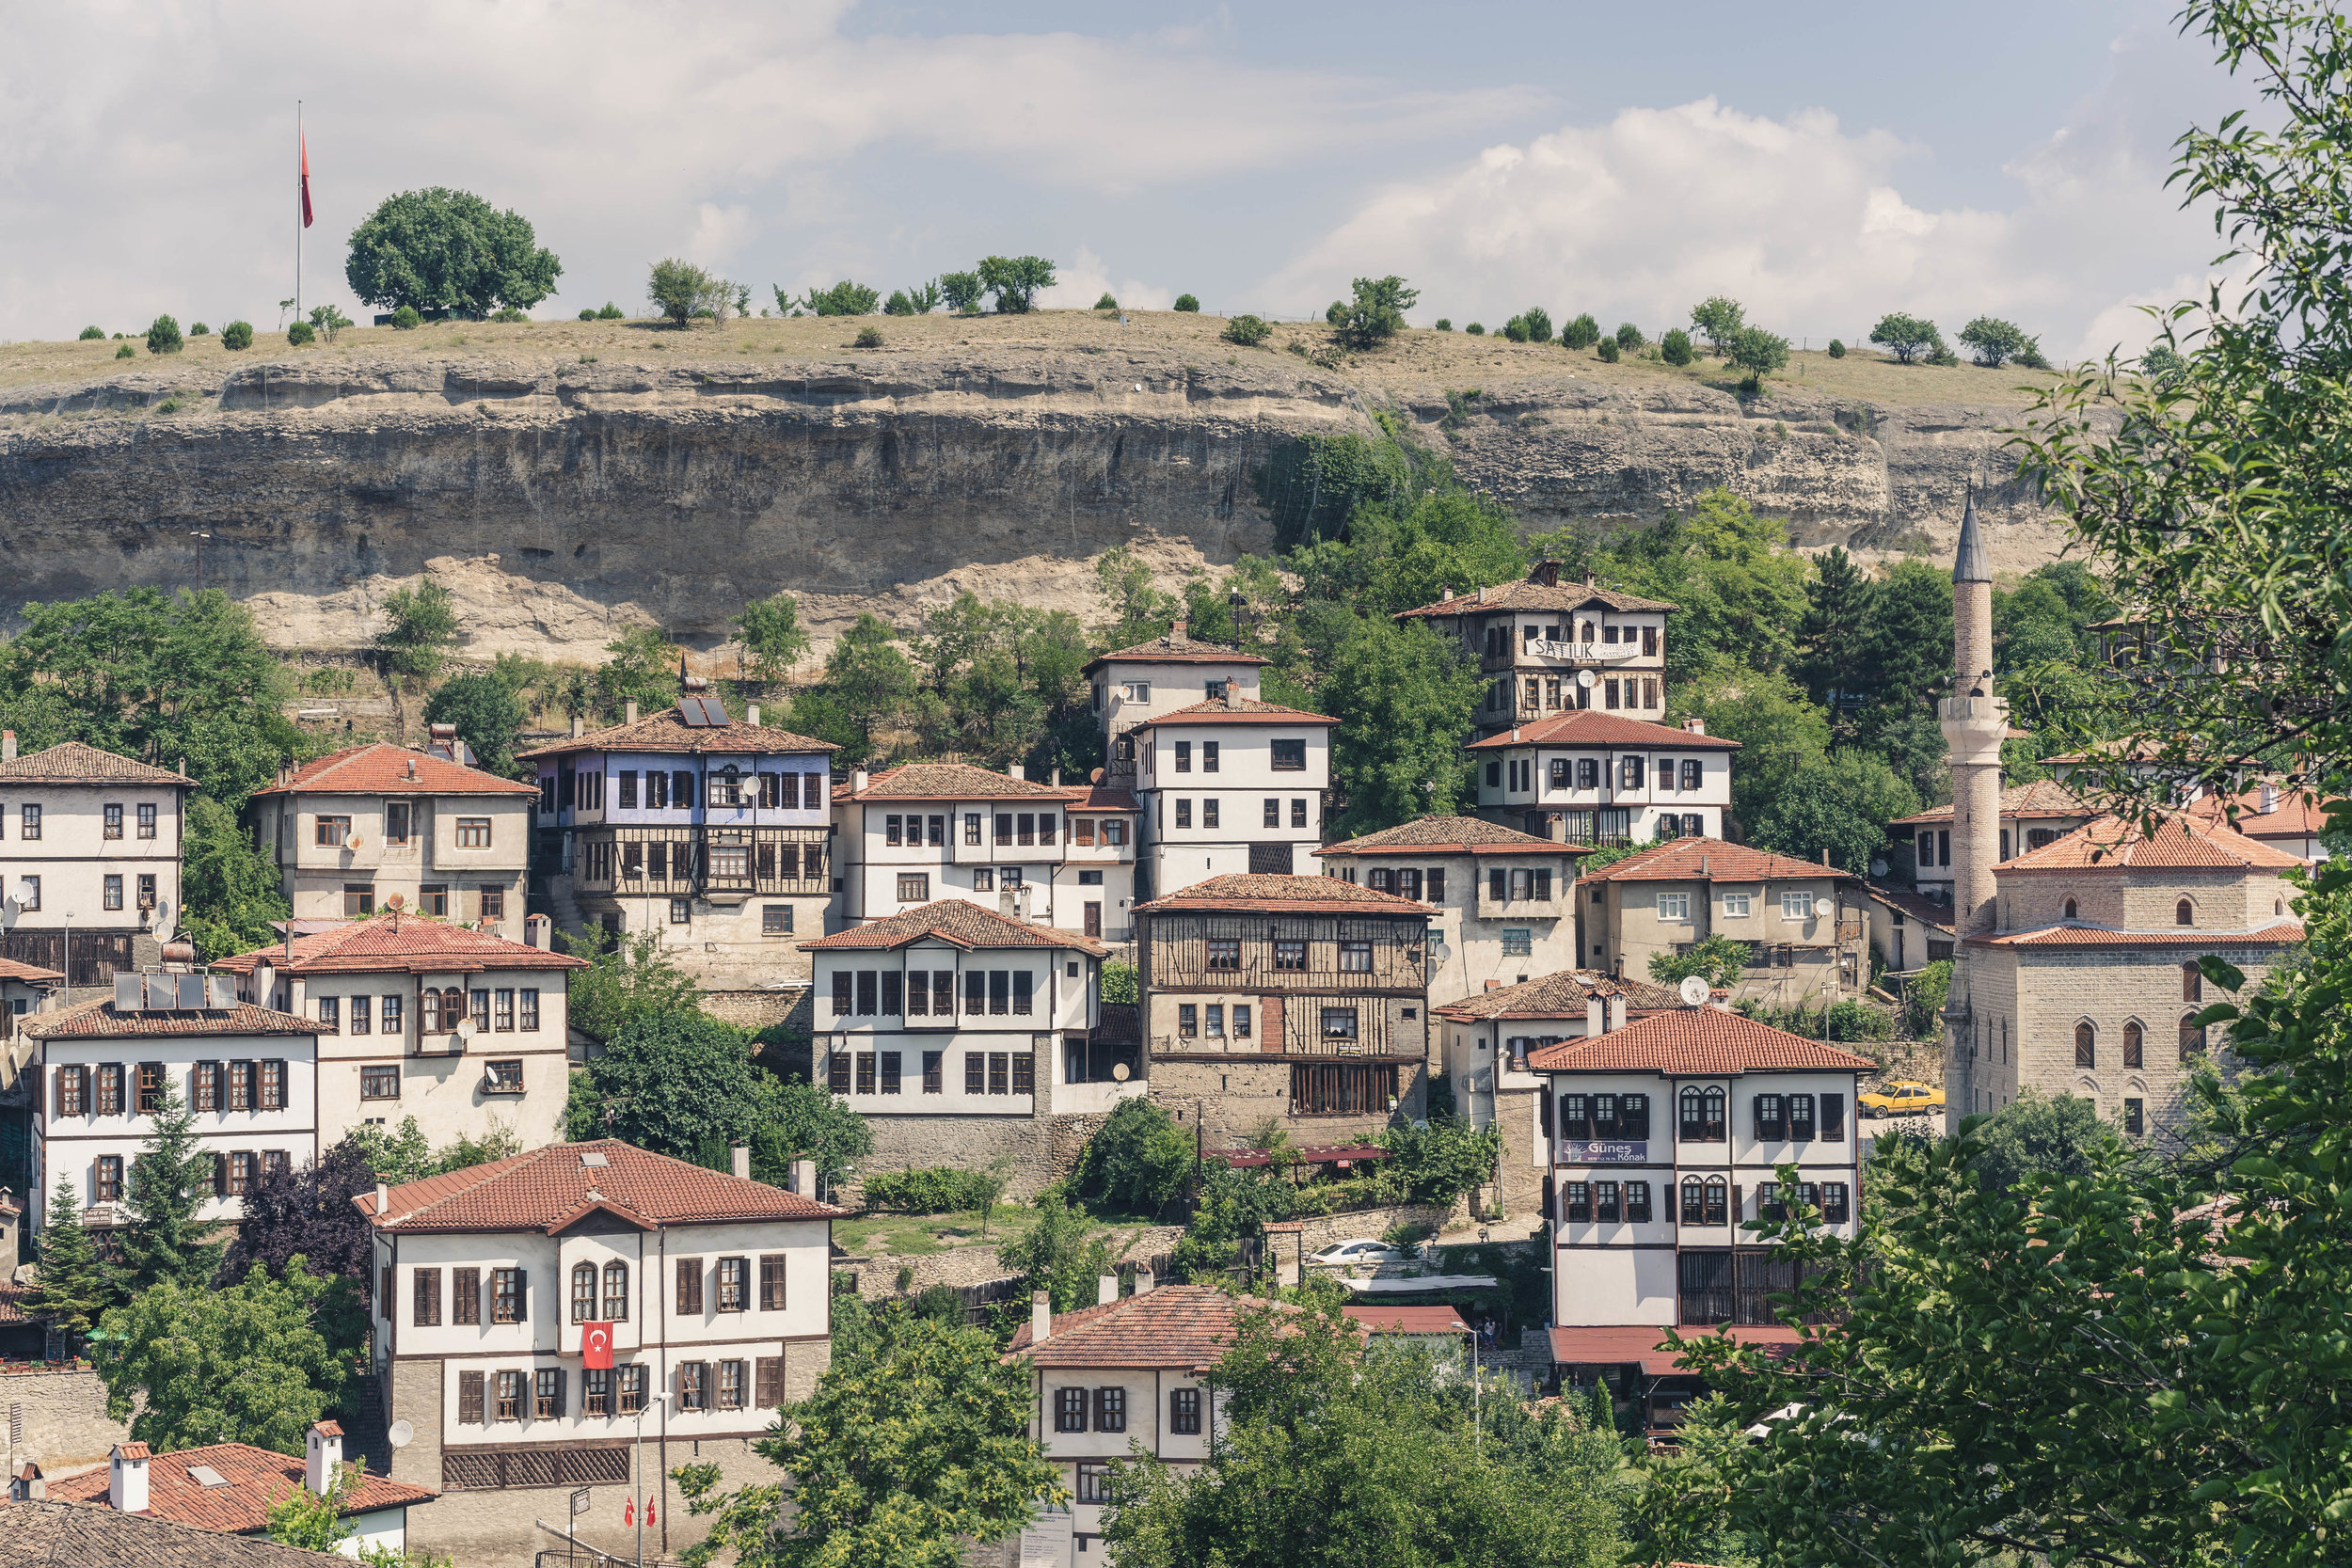 Ottoman Empire had style, Safranbolu